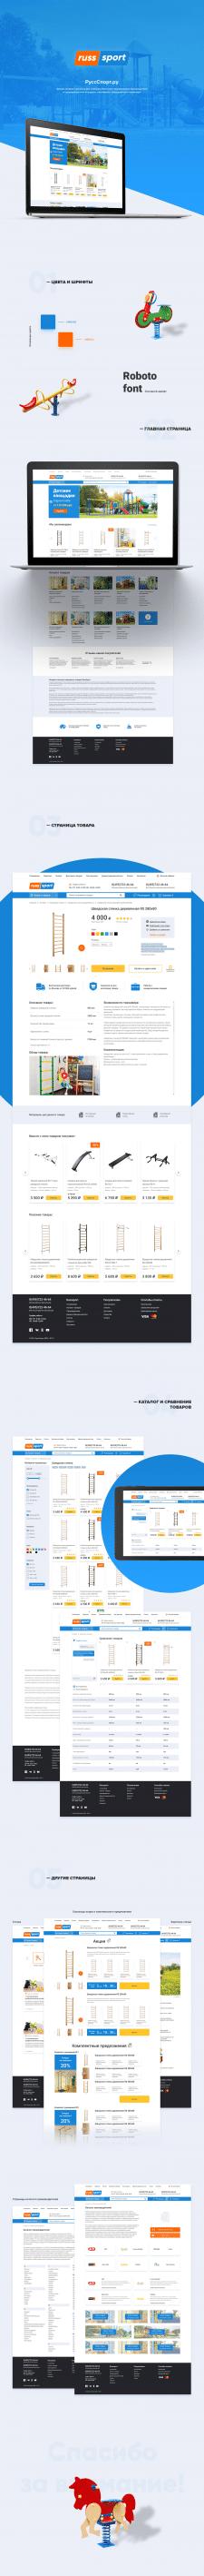 Редизайн интернет-магазина RussSport.ru